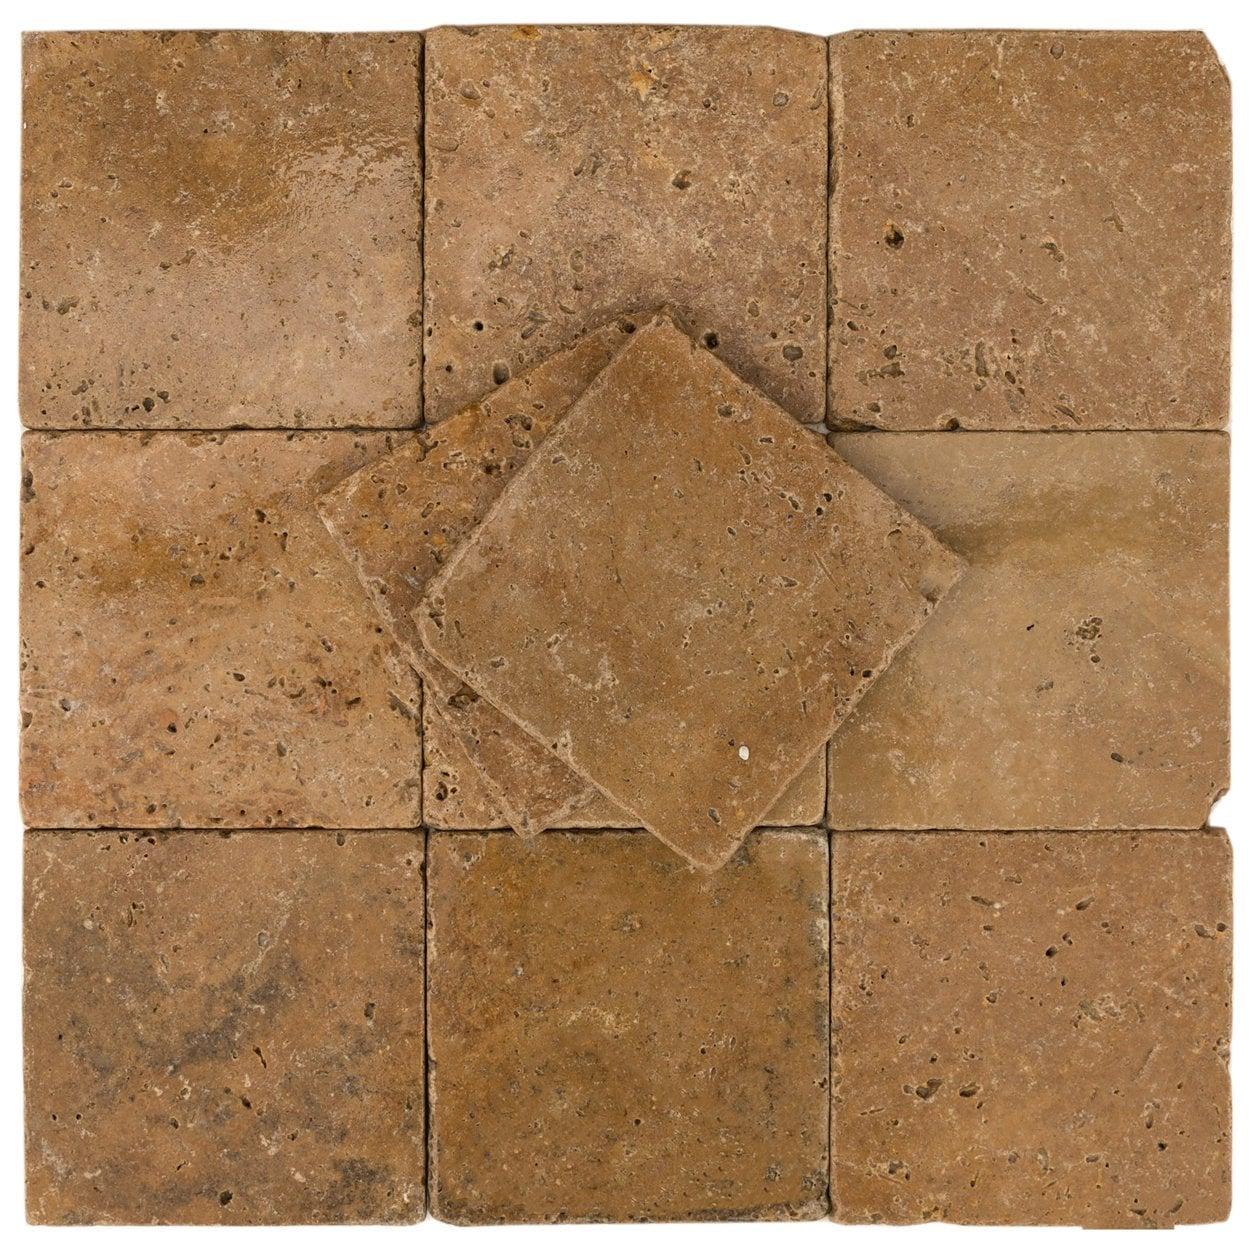 "Walnut-Premium-Light Brown / 6""x6""x3/8"" / Tumbled Antique Tumbled Travertine Backsplash Tiles 0"